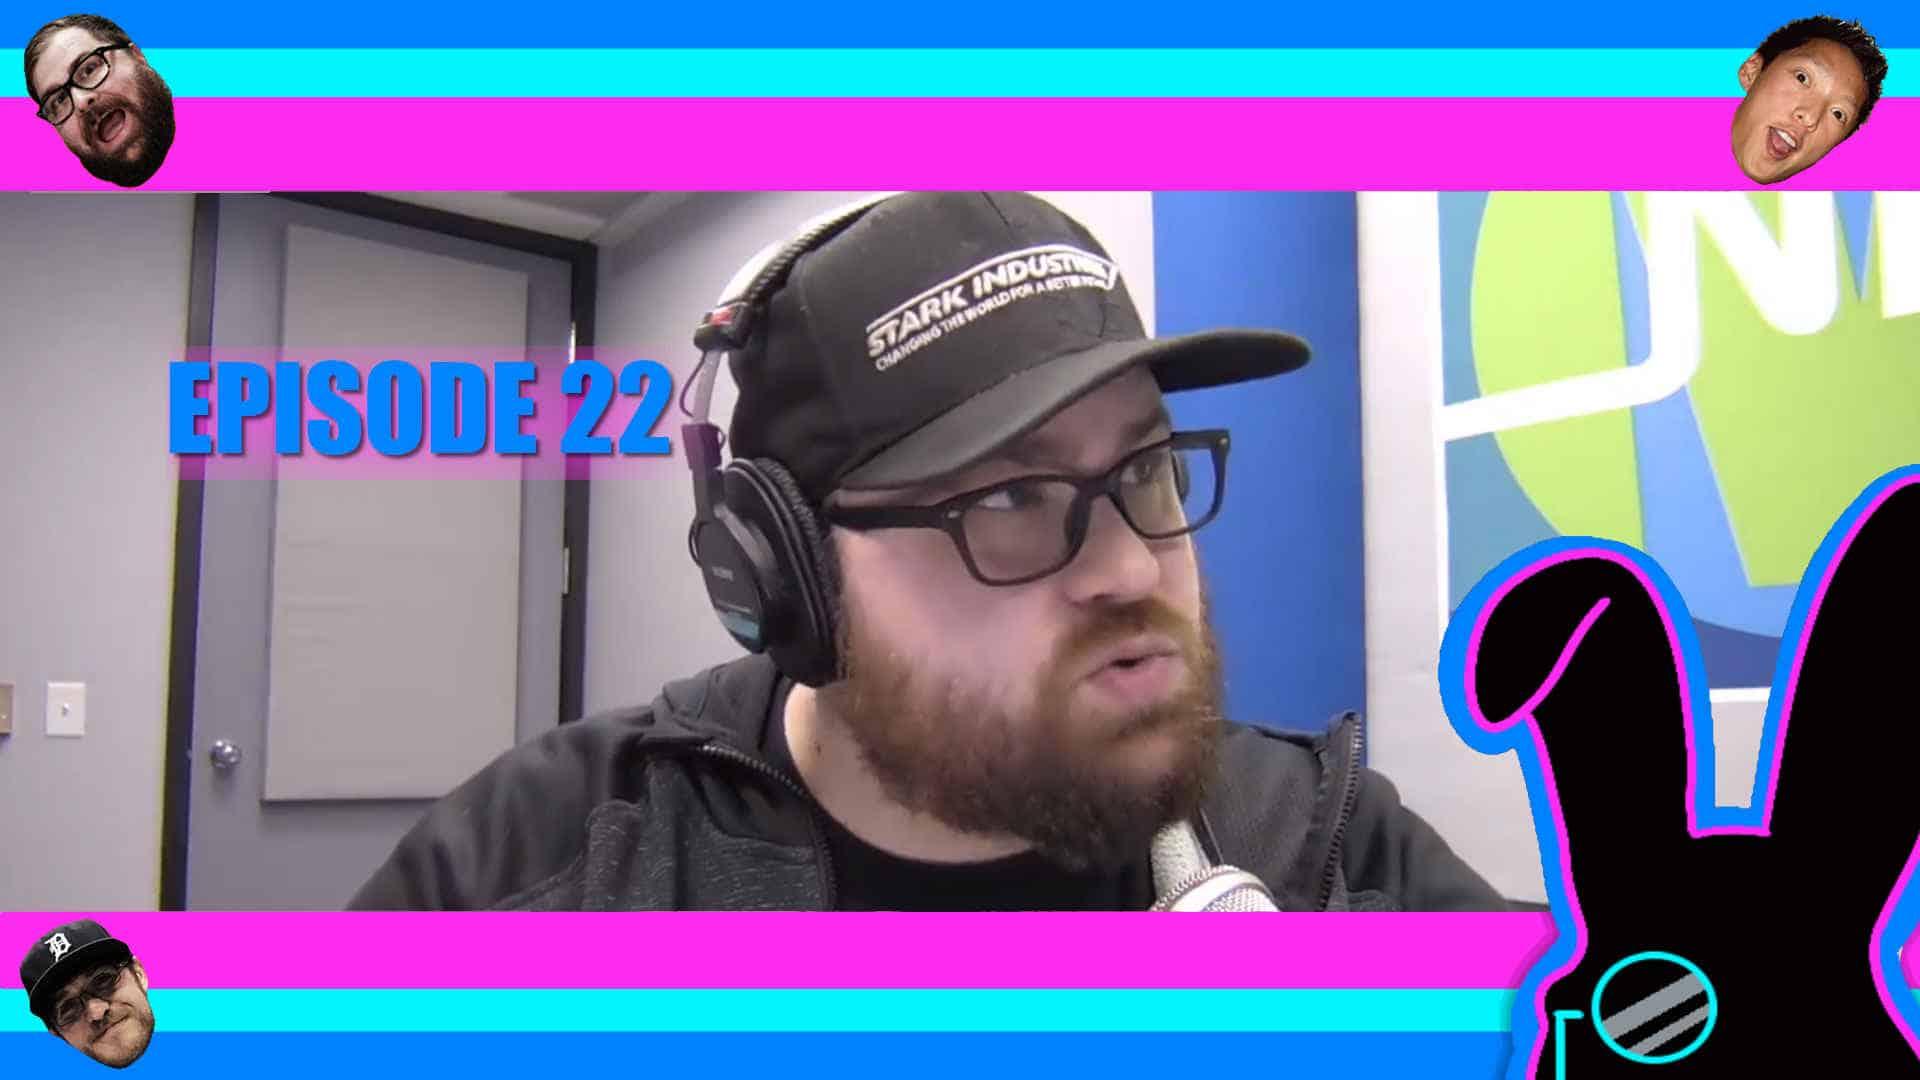 Geektainment Weekly - Episode 22